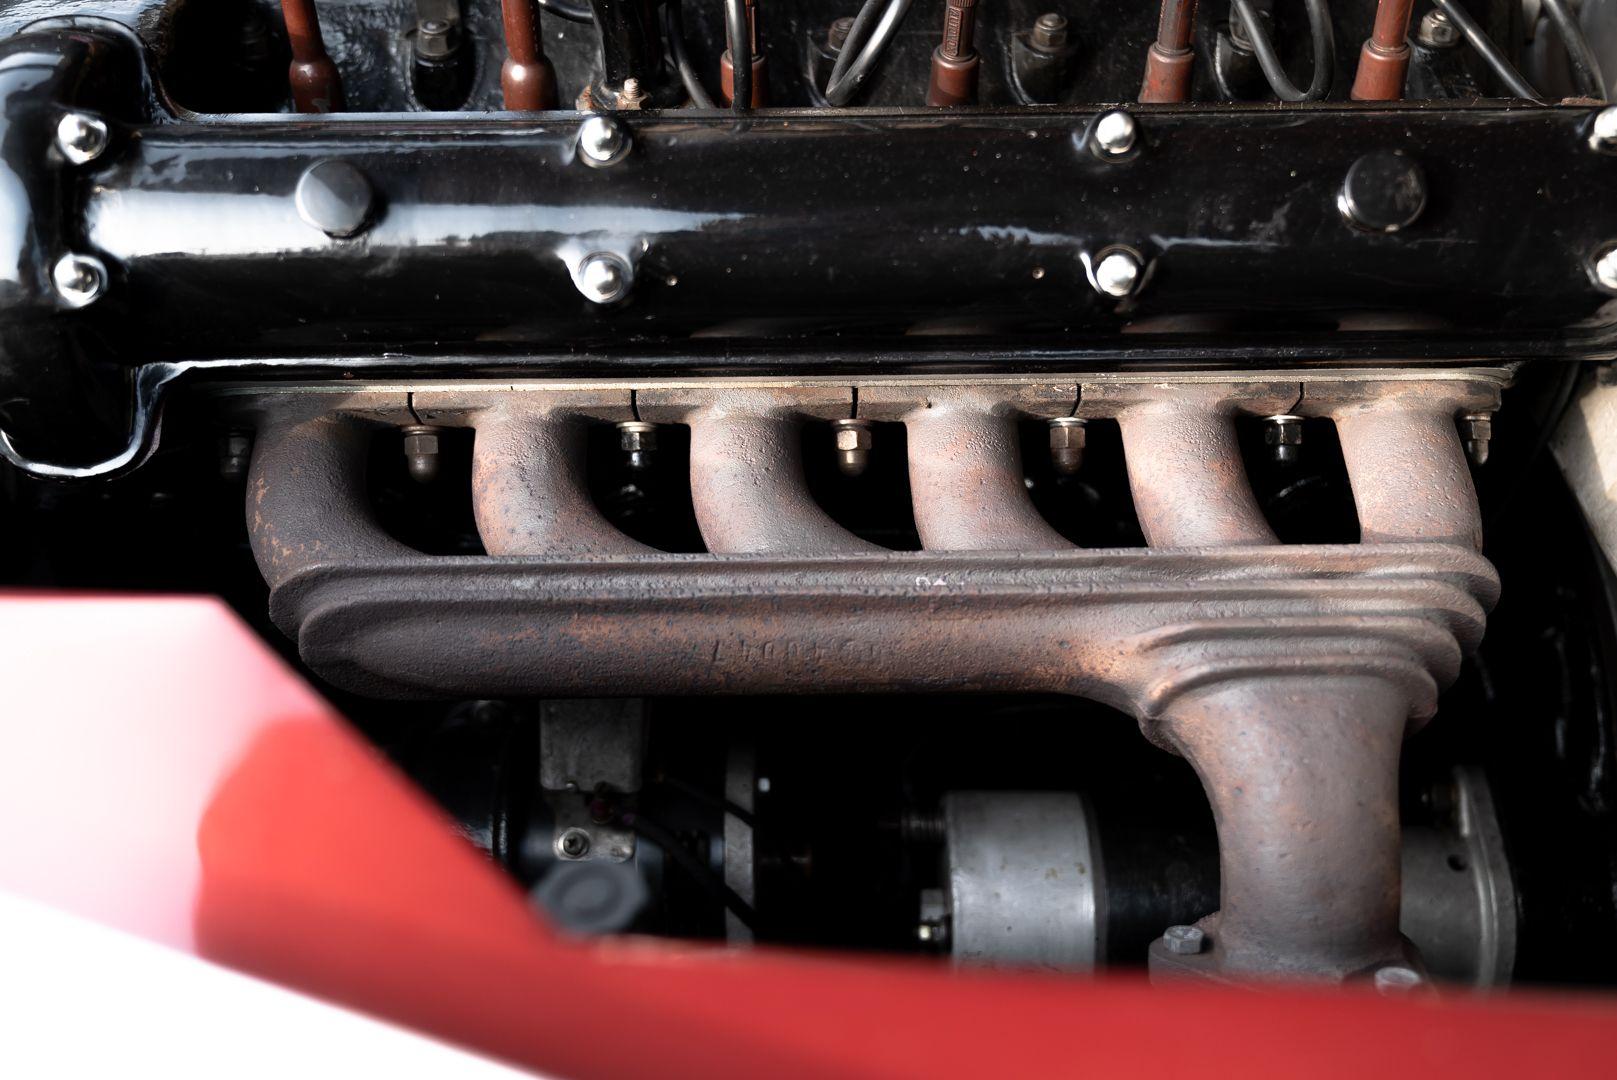 1947 Alfa Romeo Freccia d'oro 6C 2500 Sport 61727